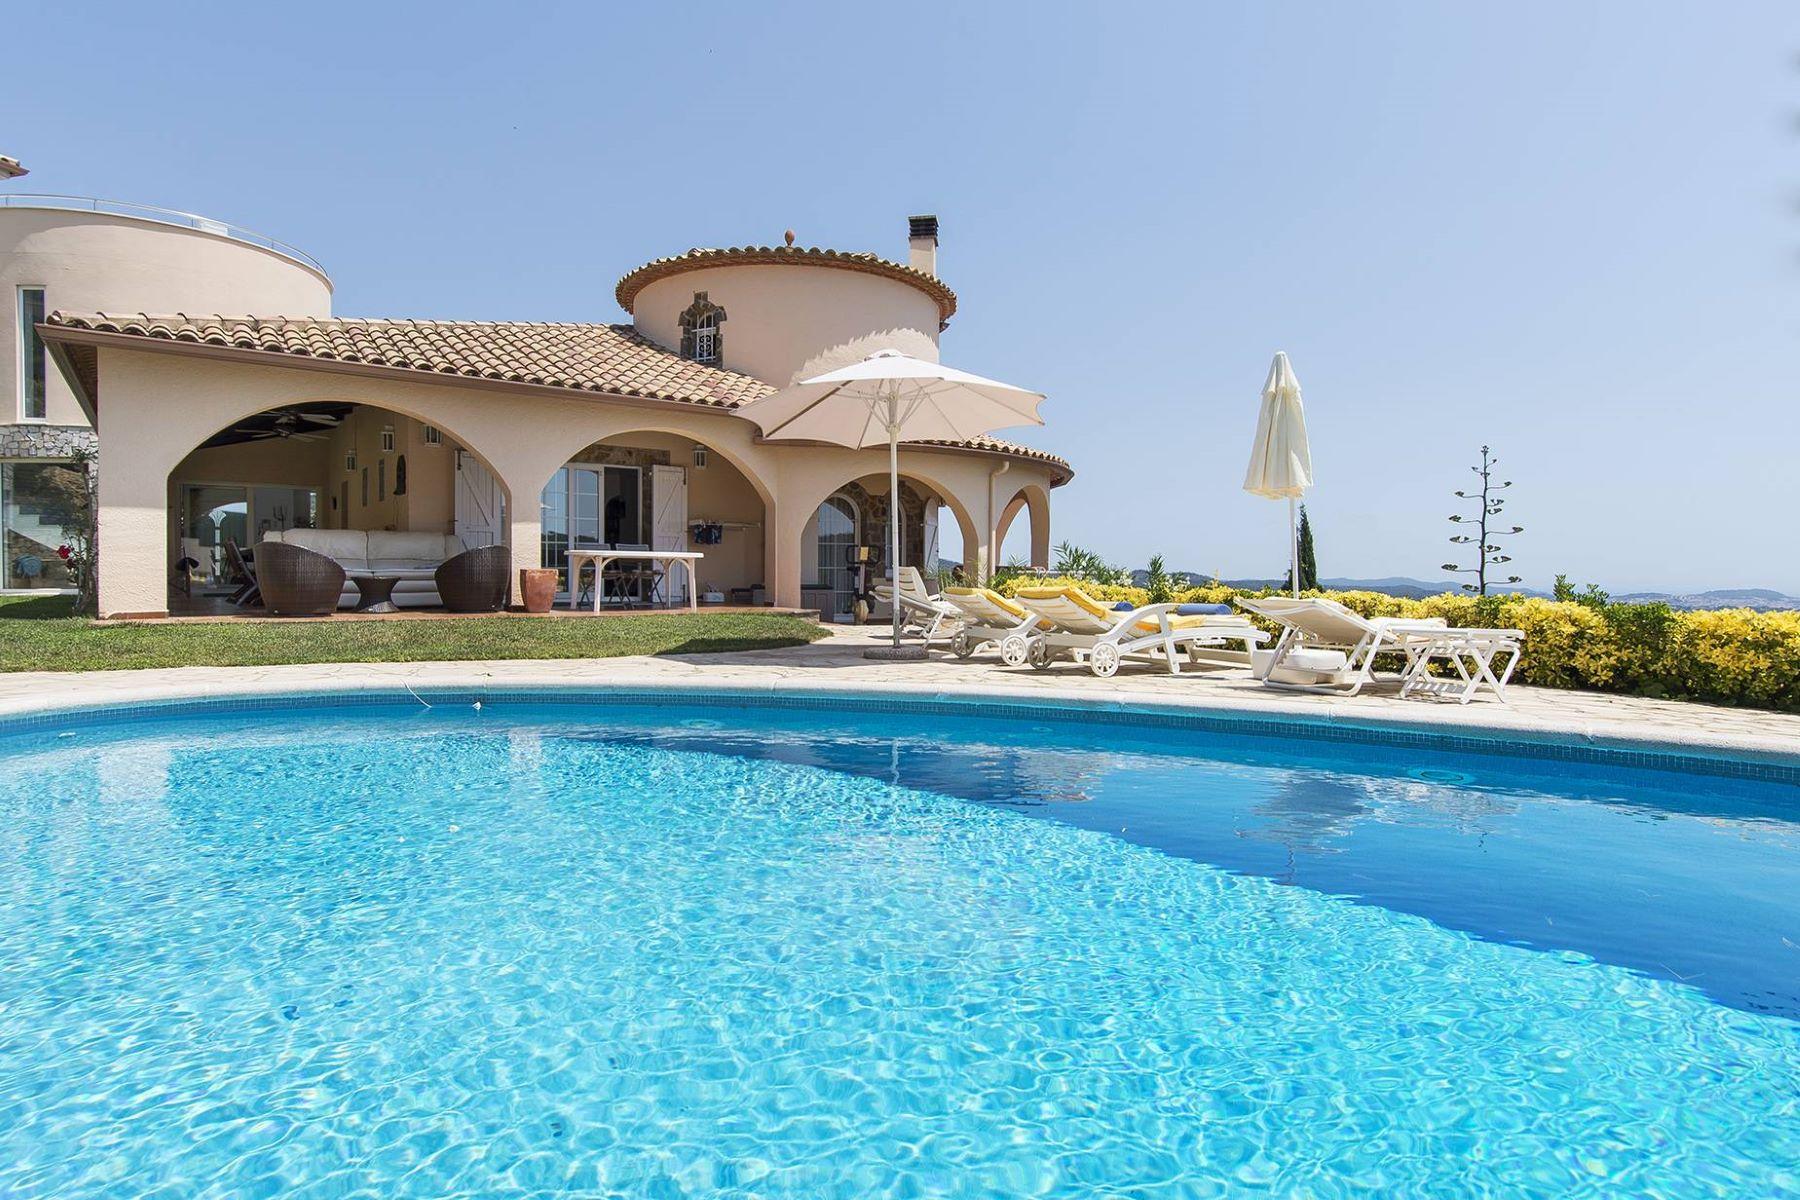 Single Family Home for Sale at Spacious villa with panoramic views Sant Antoni De Calonge, Costa Brava, 17252 Spain